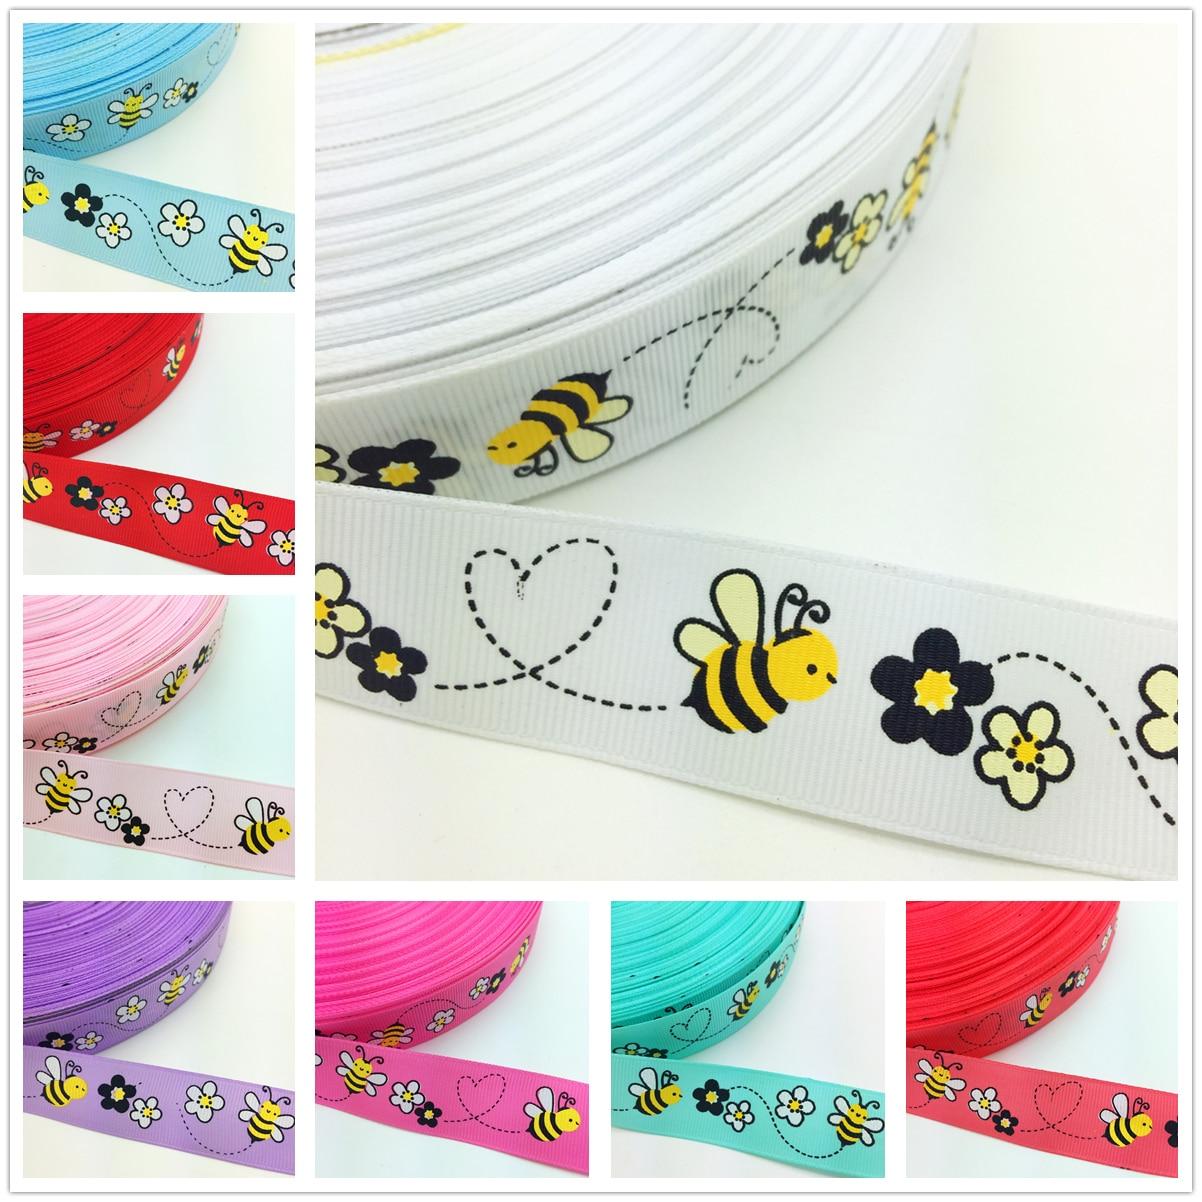 DIY 5 Yard 1/'/' 25MM LOVE Printed Grosgrain Ribbon Hair Bow Sewing Ribbon